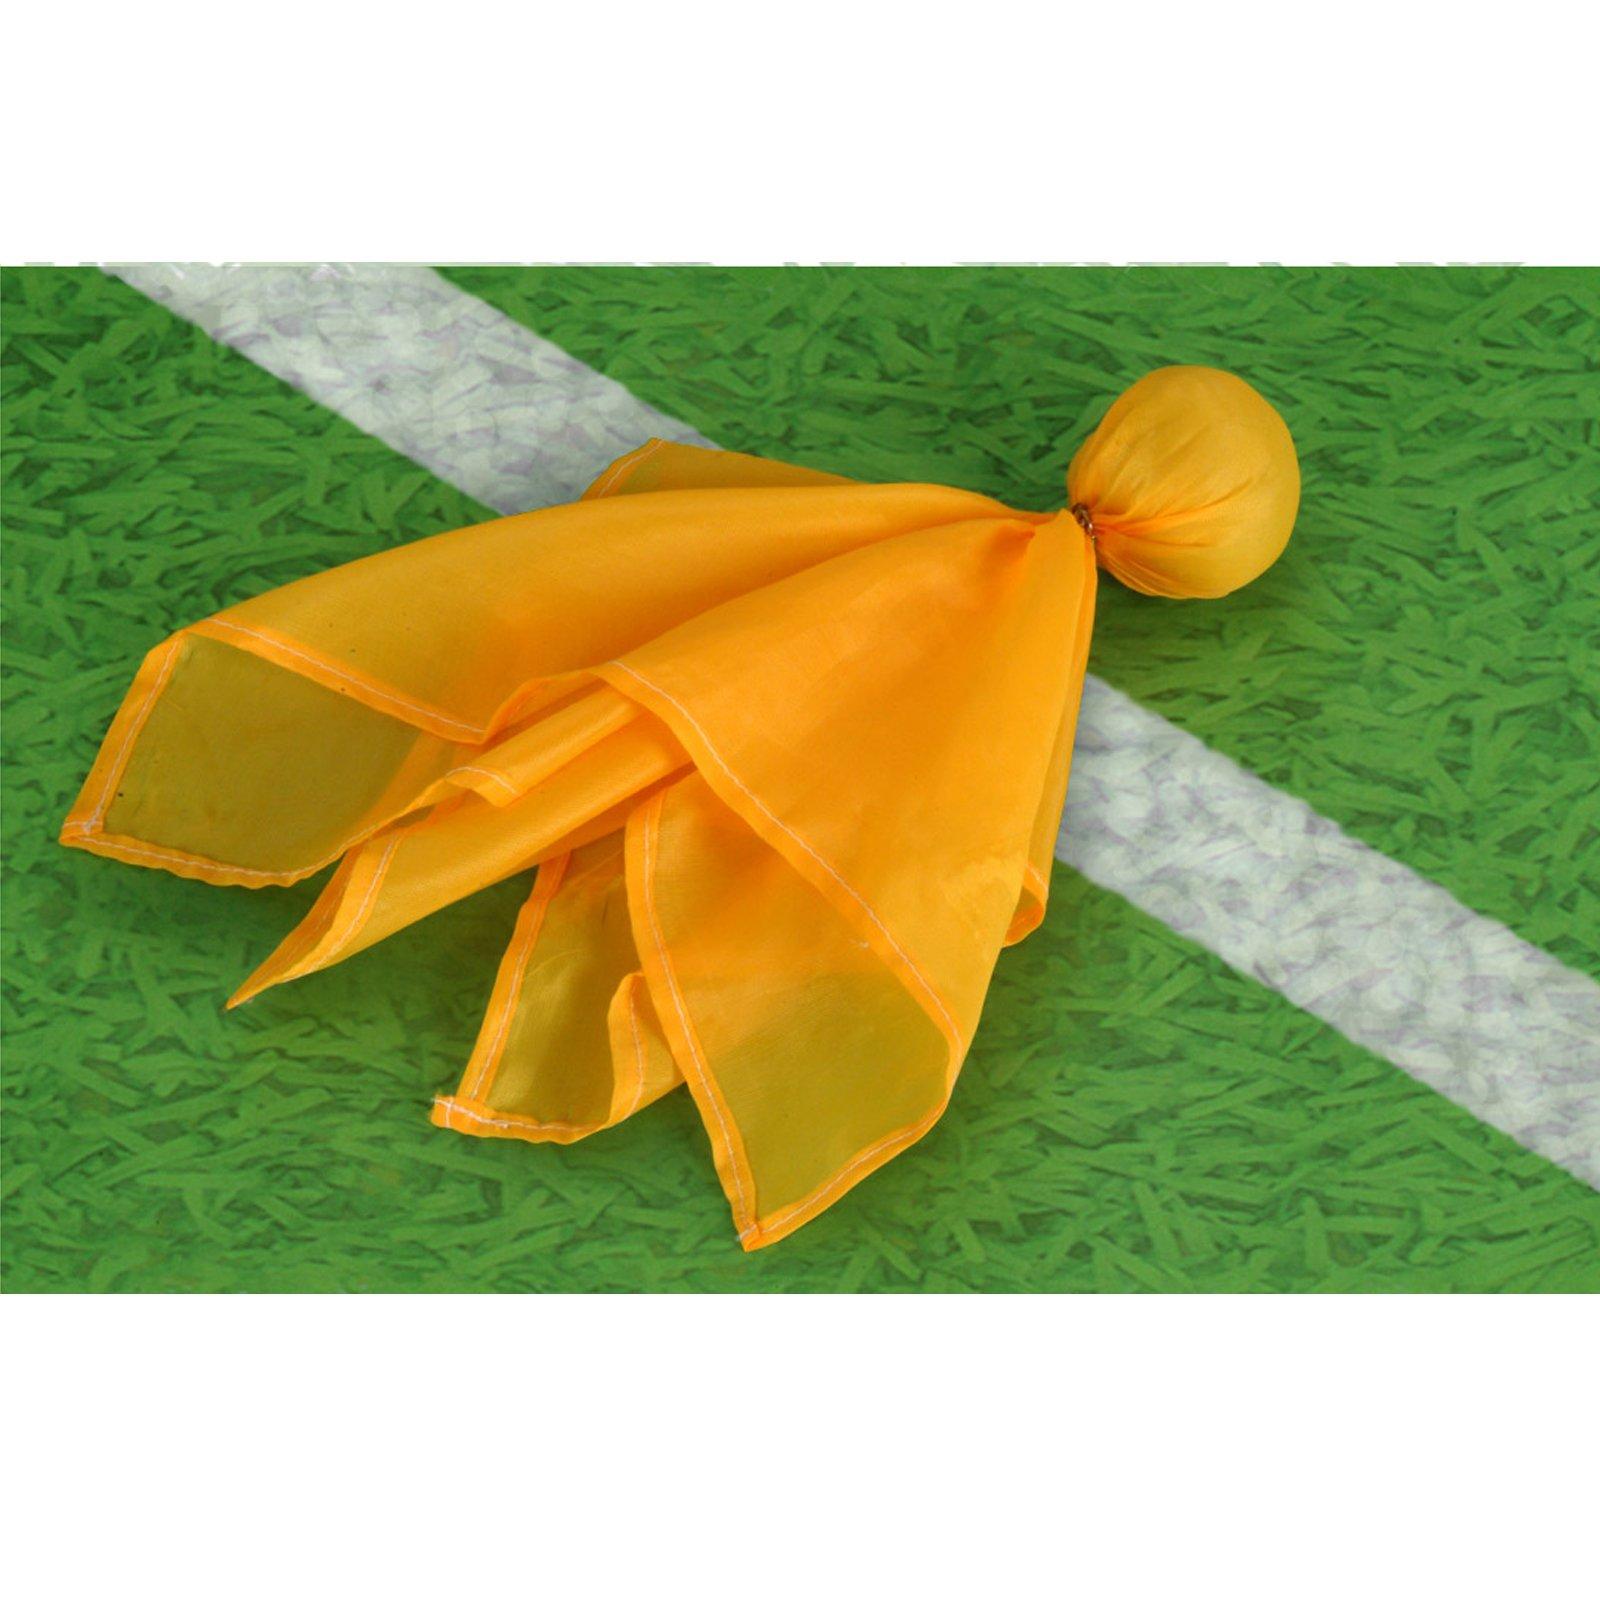 Super Bowl Fuels Demand for Football Party Supplies